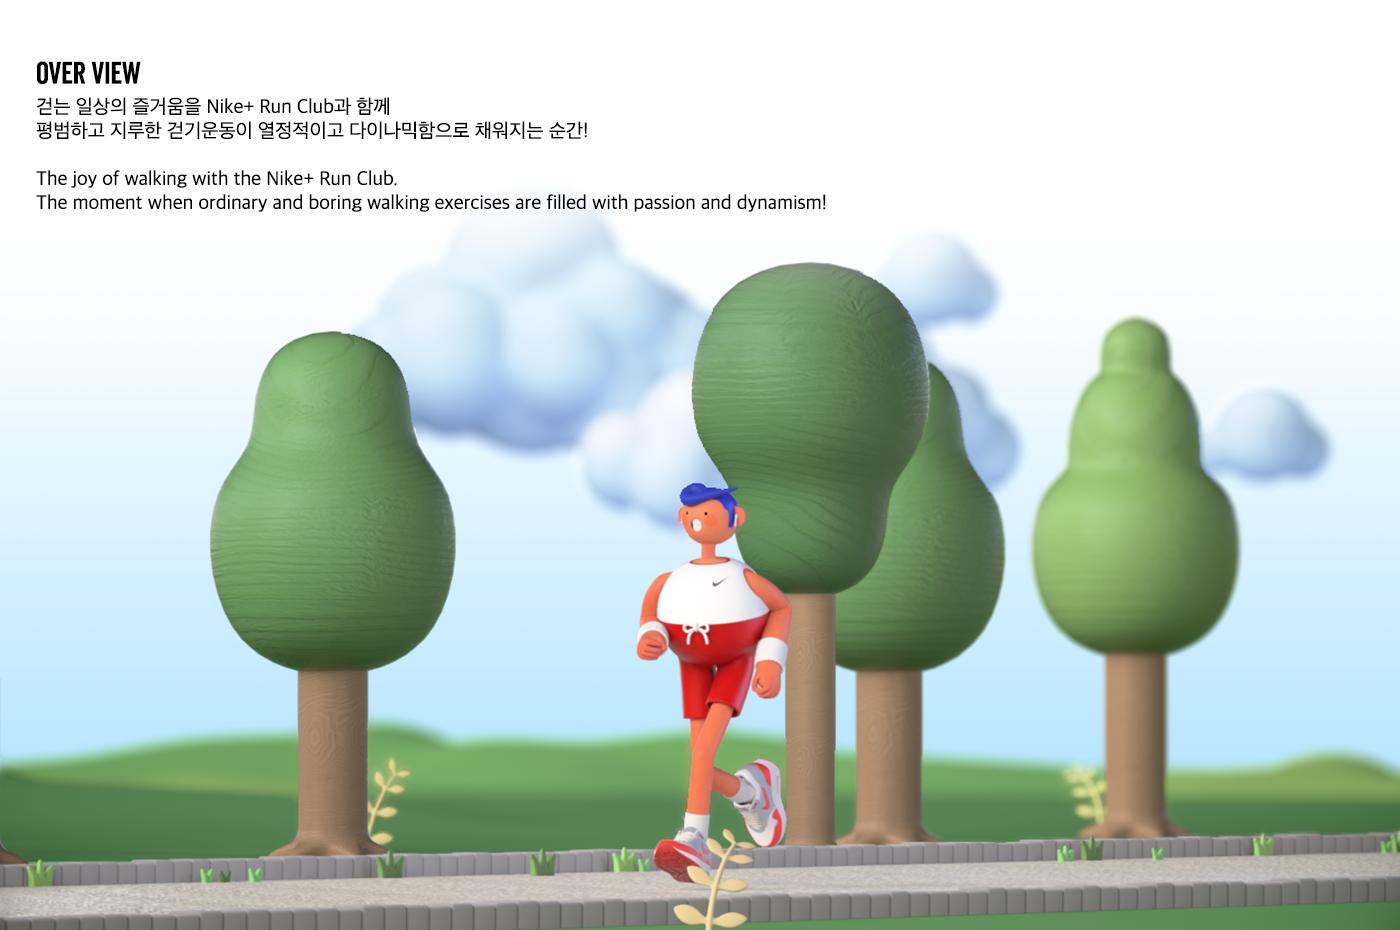 3D 3Dchracter c4d chracter cinema4d design motion motion graphic Nike VDAS